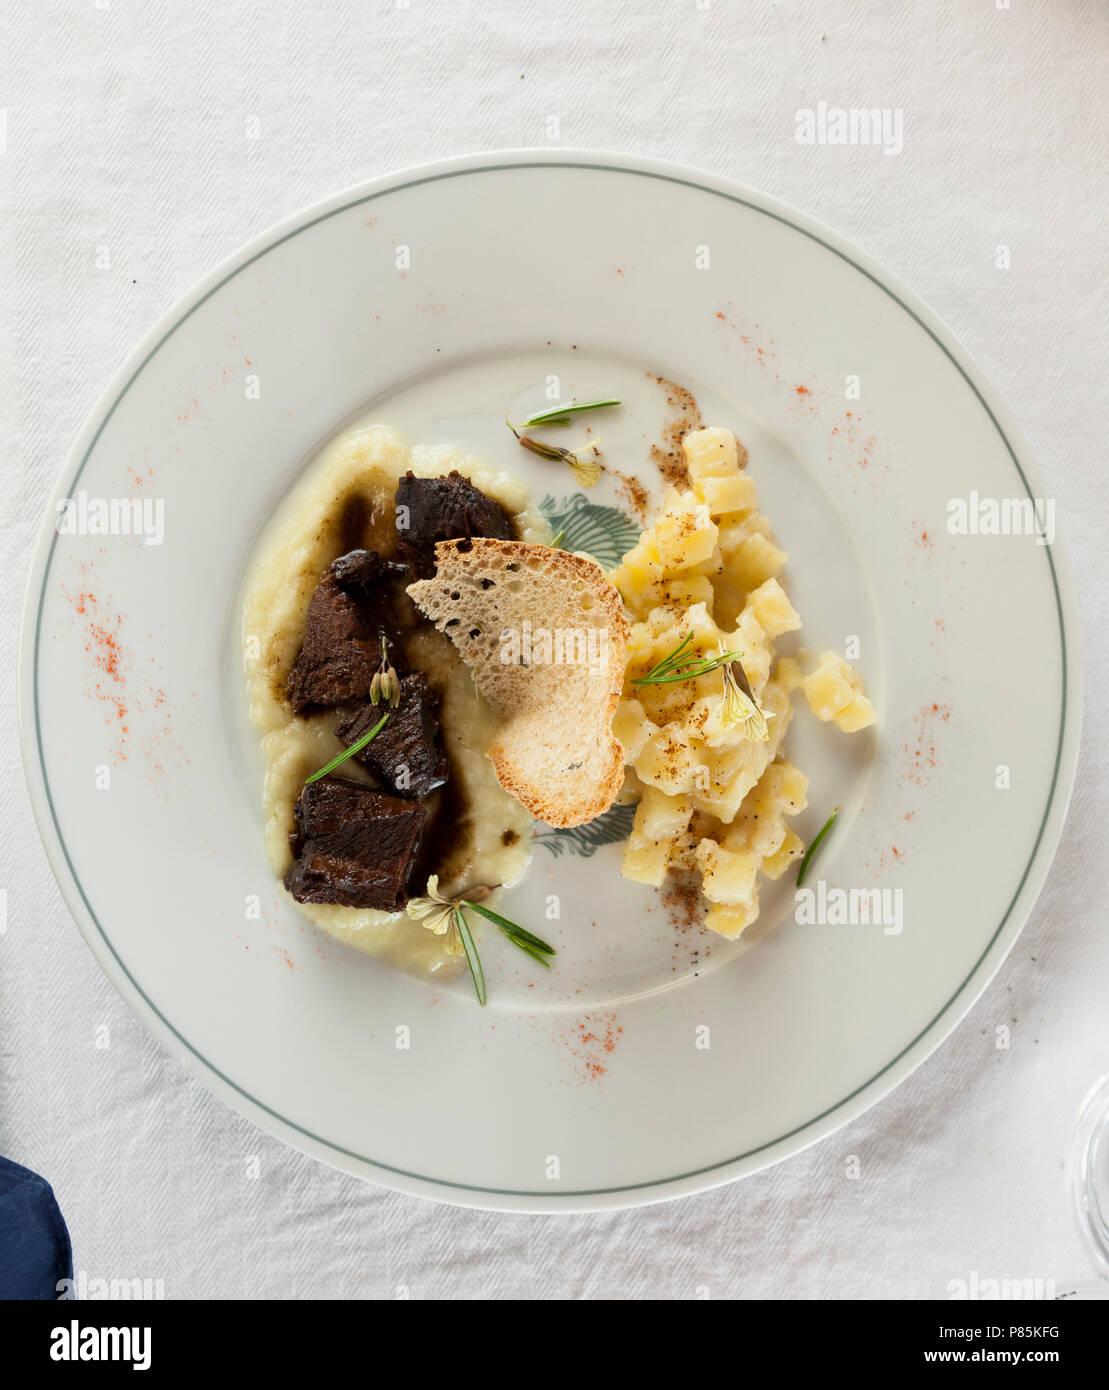 Italienisches Essen Stockbild